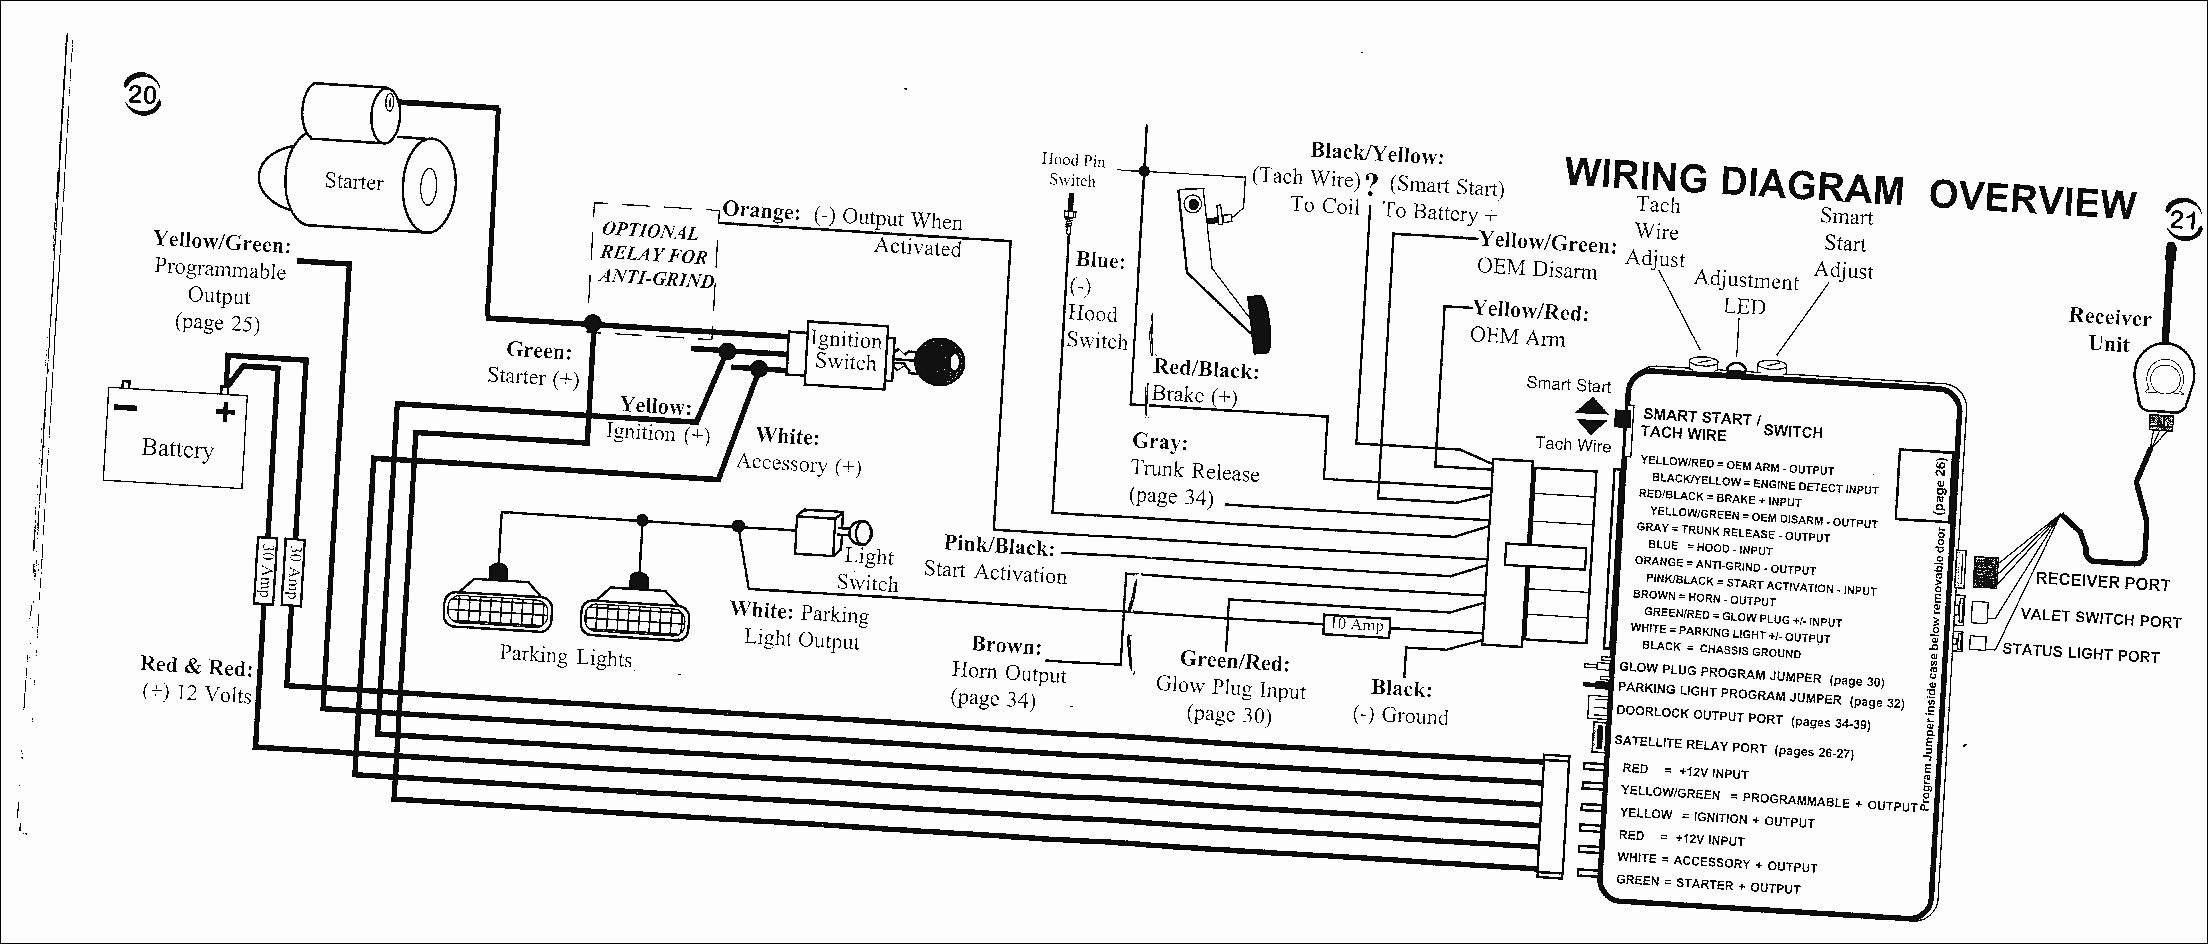 5706 Viper Alarm Wiring Diagram Viper 5601 Wiring Diagram Of 5706 Viper Alarm Wiring Diagram